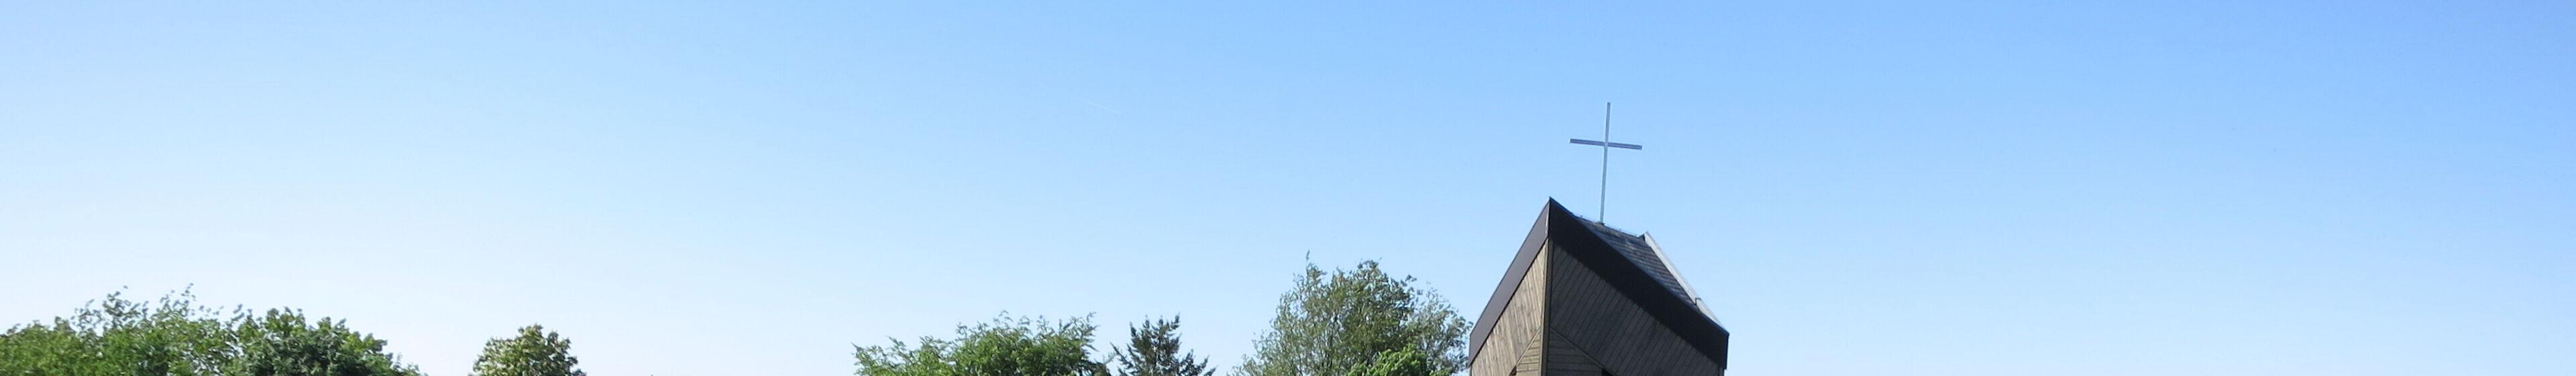 Paulus-Luftaufnahme-Himmel_3840x560px